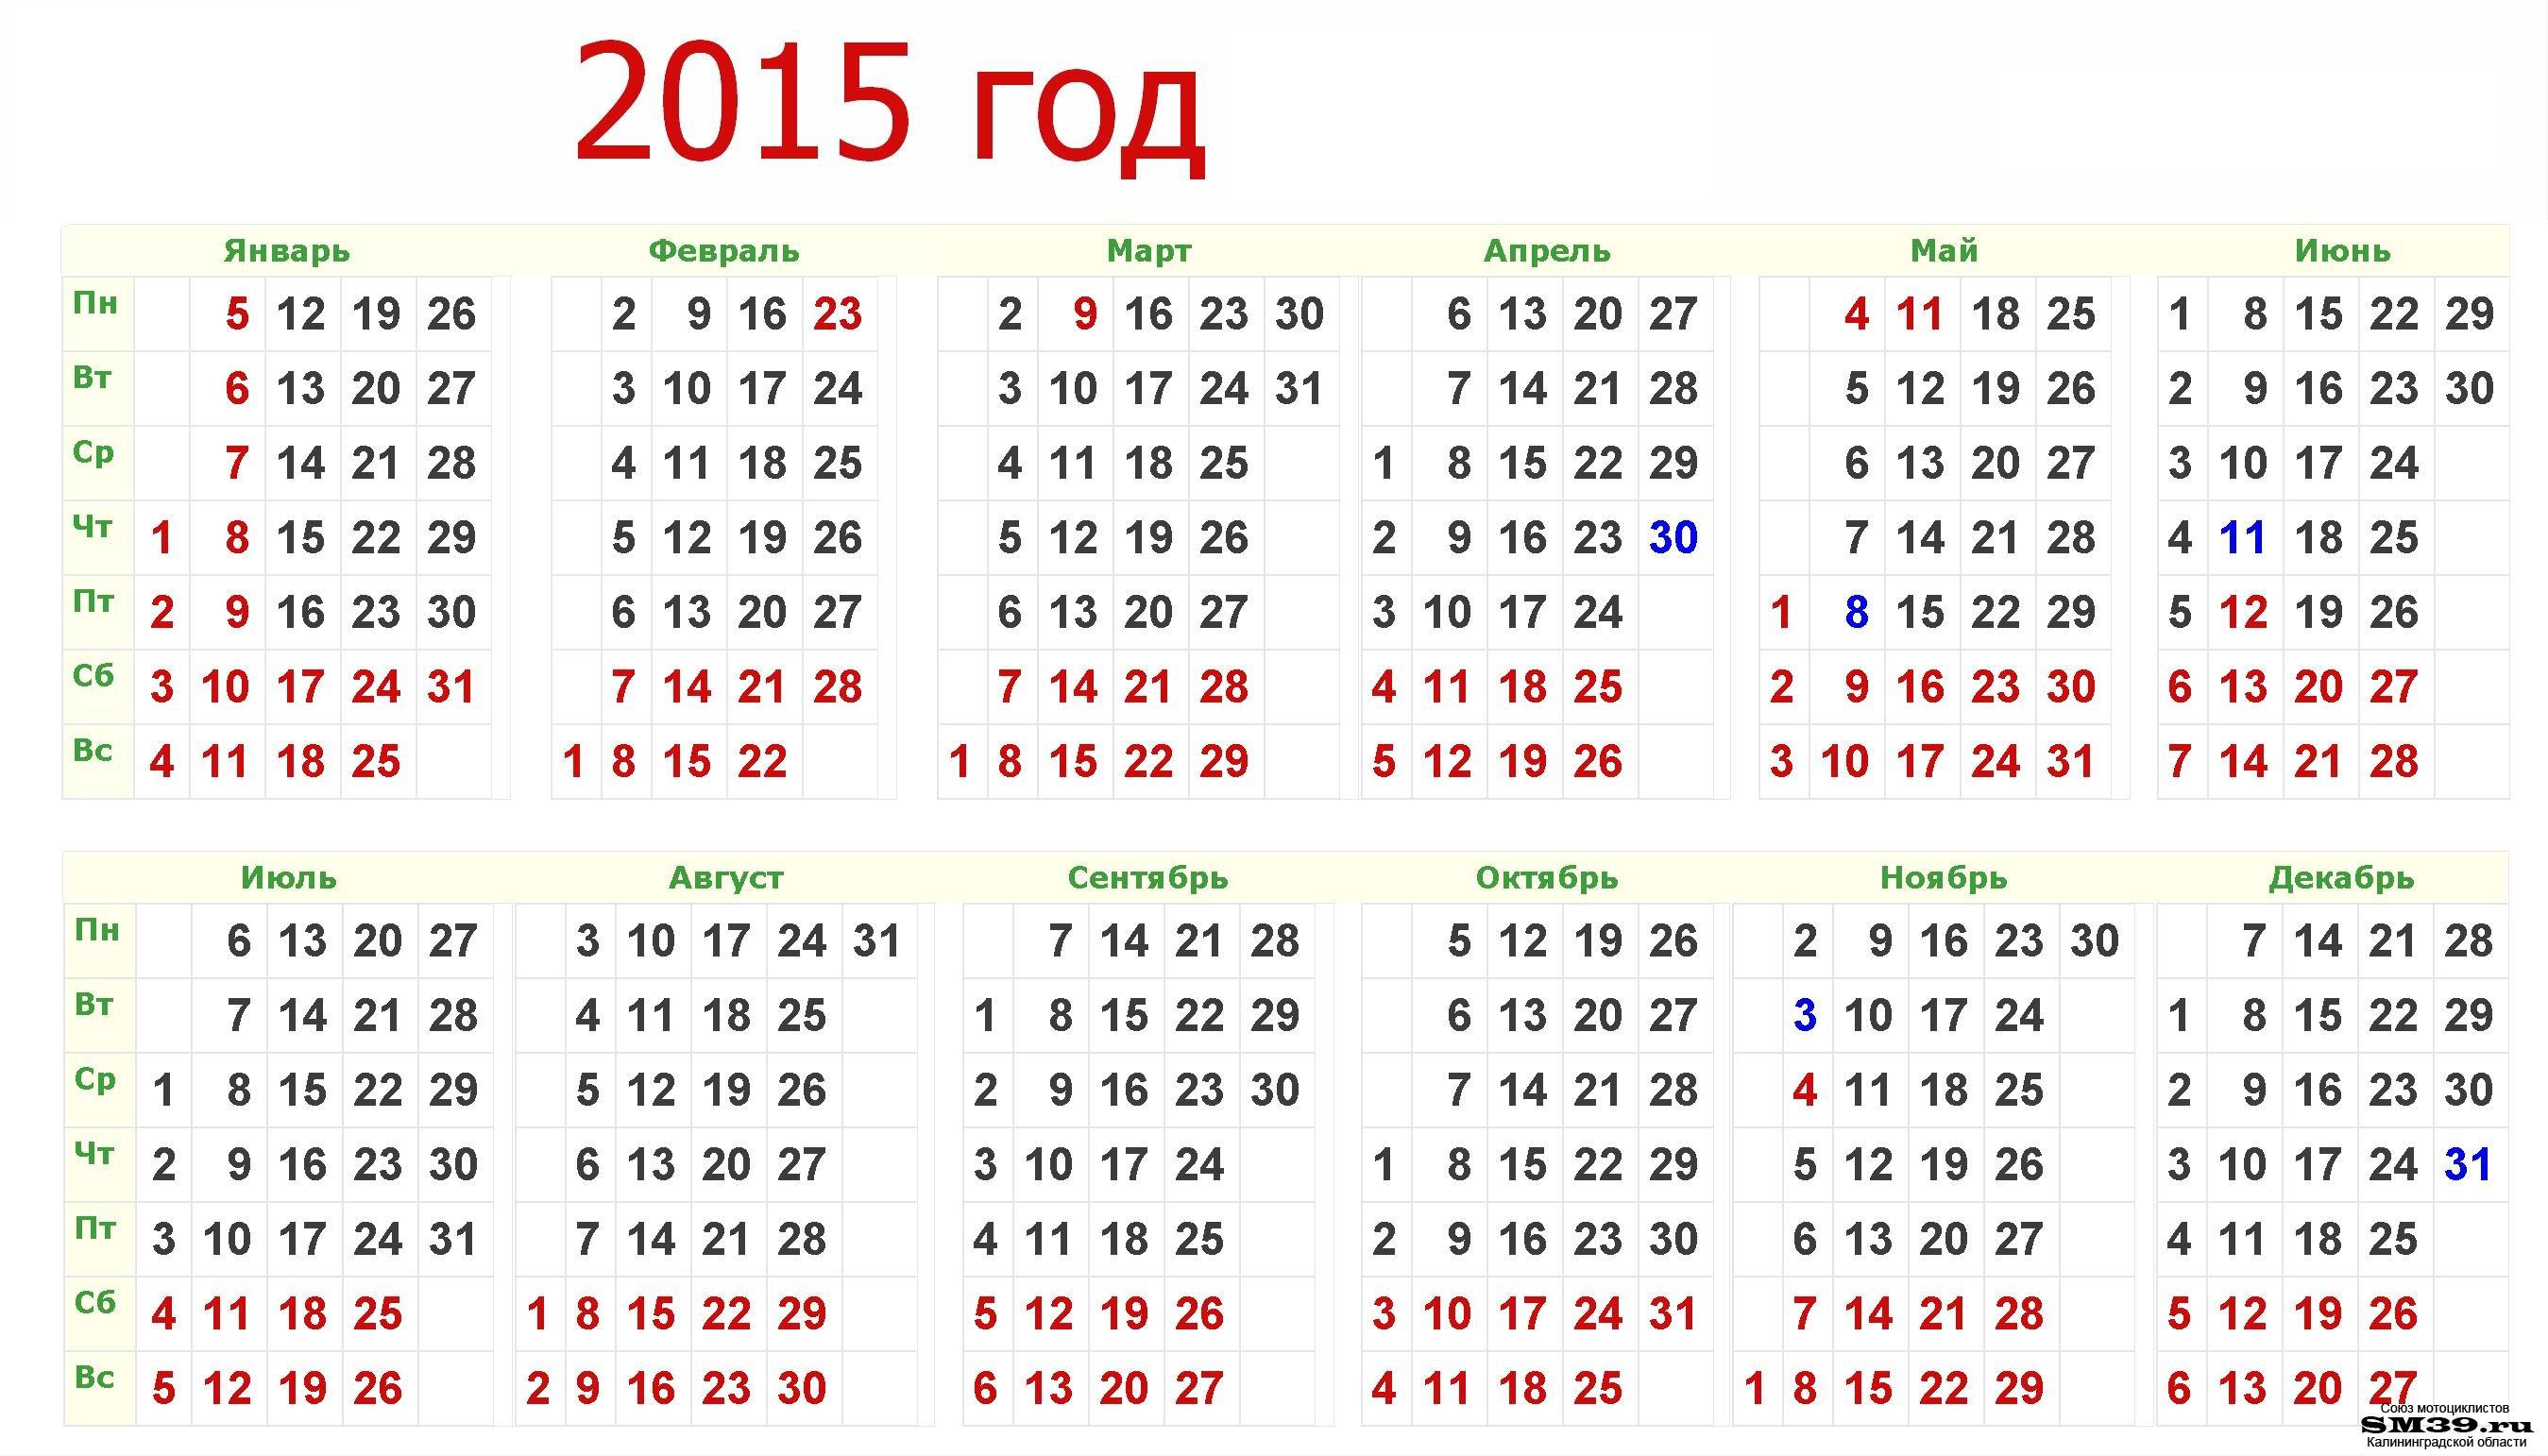 Календарь мероприятий на 2015 год